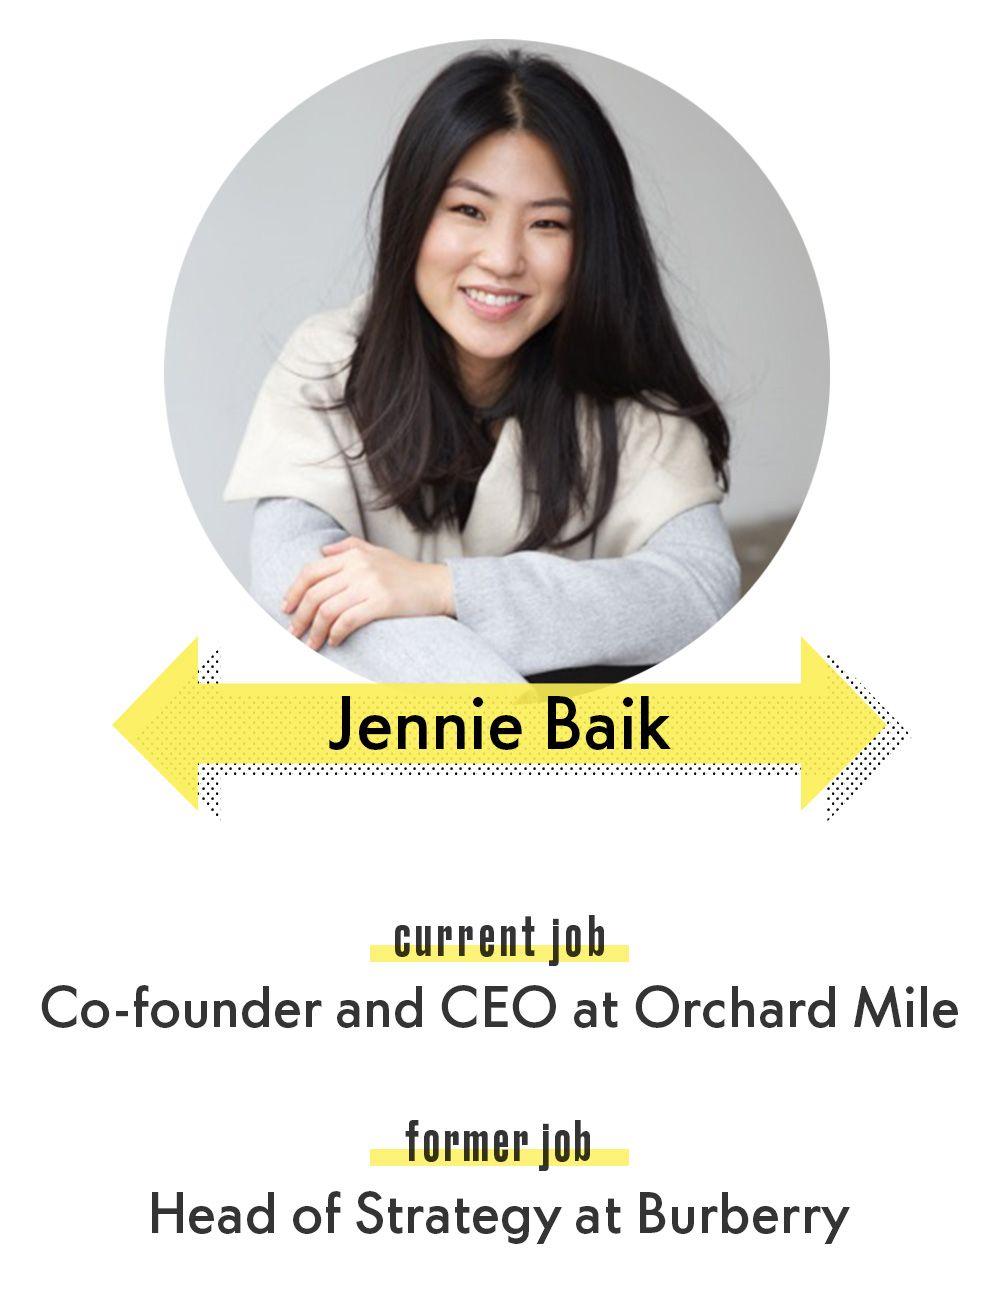 Jennie Baik Orchard Mile